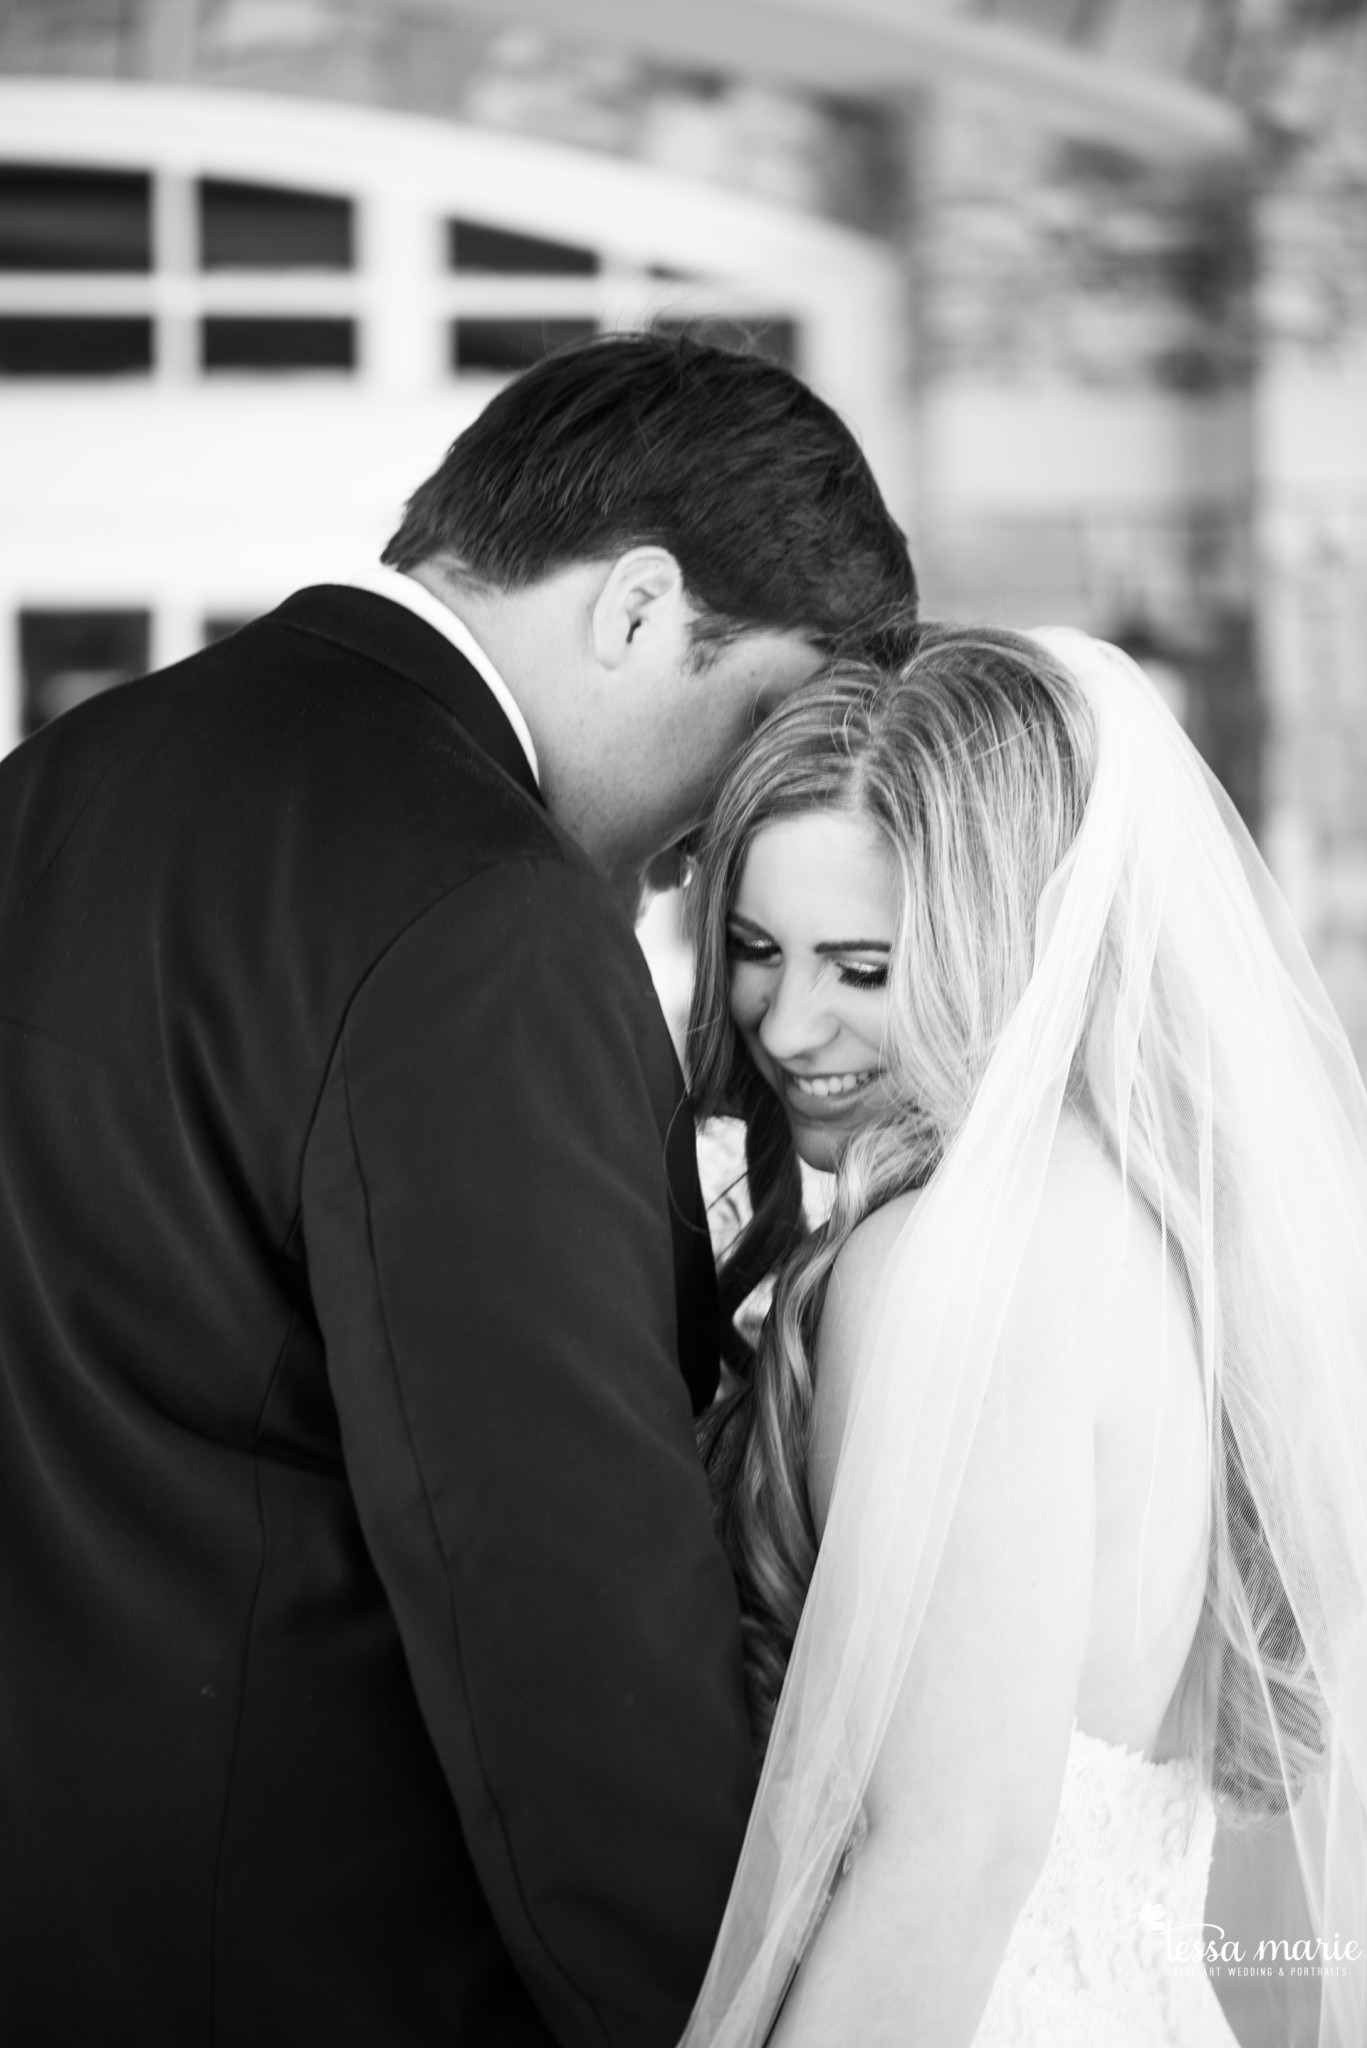 tessa_marie_legacy_moments_storytelling_candid_emotionally_driven_wedding_photographer_atlanta_wedding_photography_st_ives_country_club_wedding_boukates_bridals_by_lori_0011